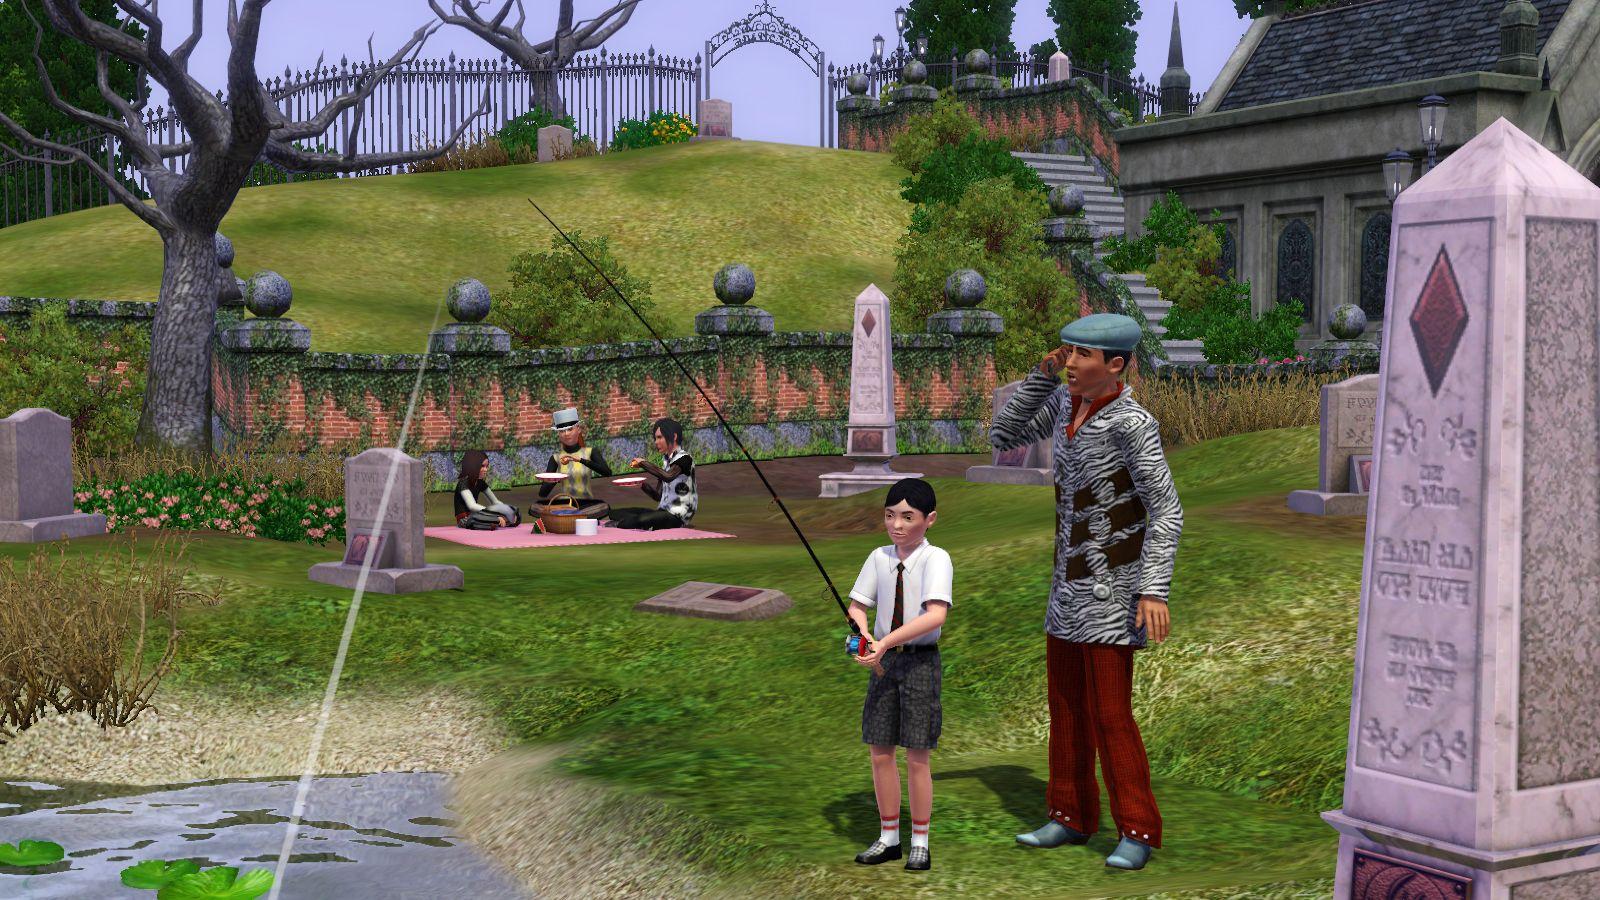 Sims 3 скачать на java - 8a